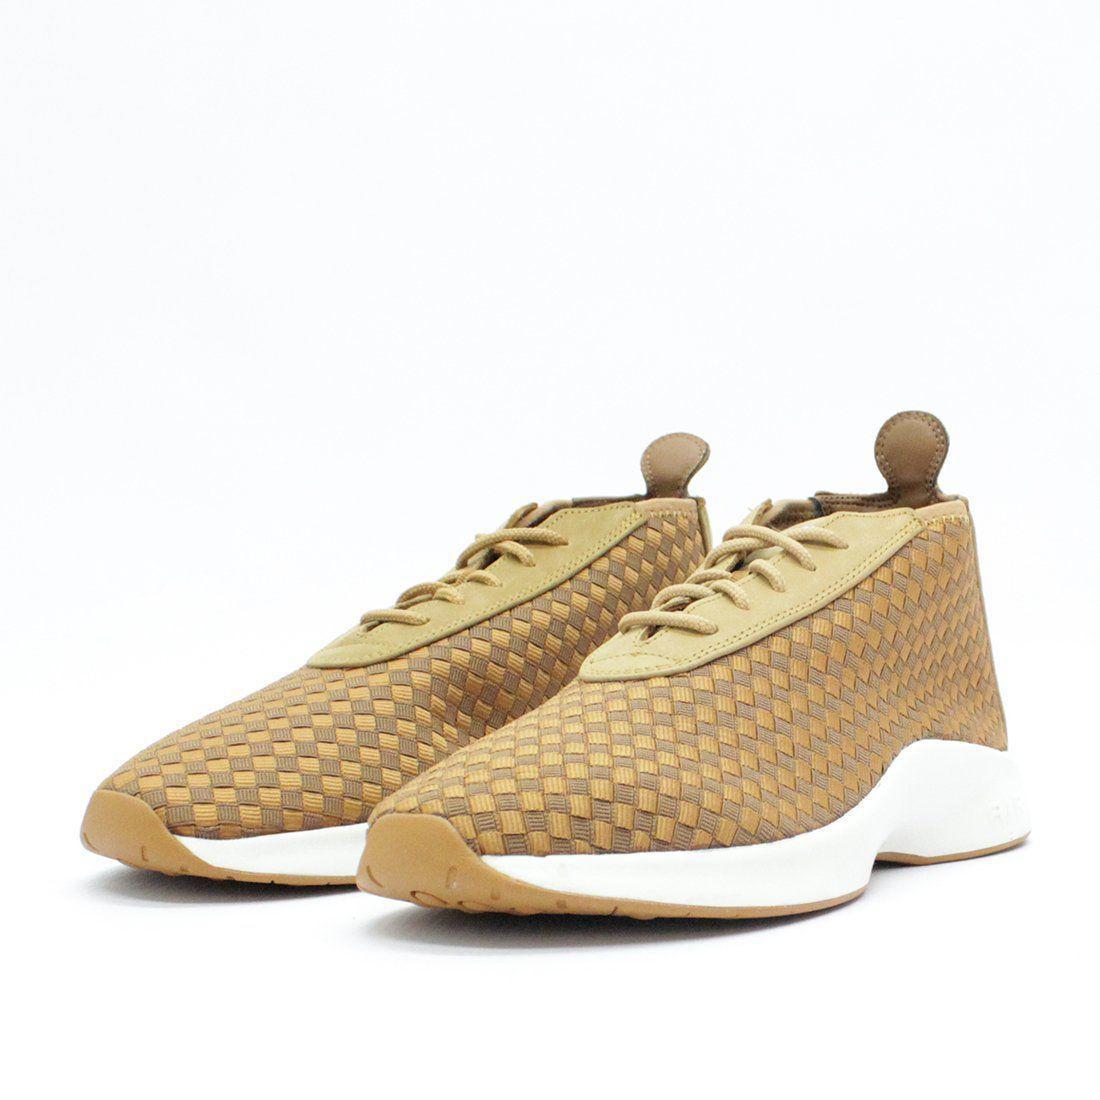 cc5269c0d52 Lyst - Nike Trainers Nike Air Woven Boot Premium Flax Brown 924463 ...